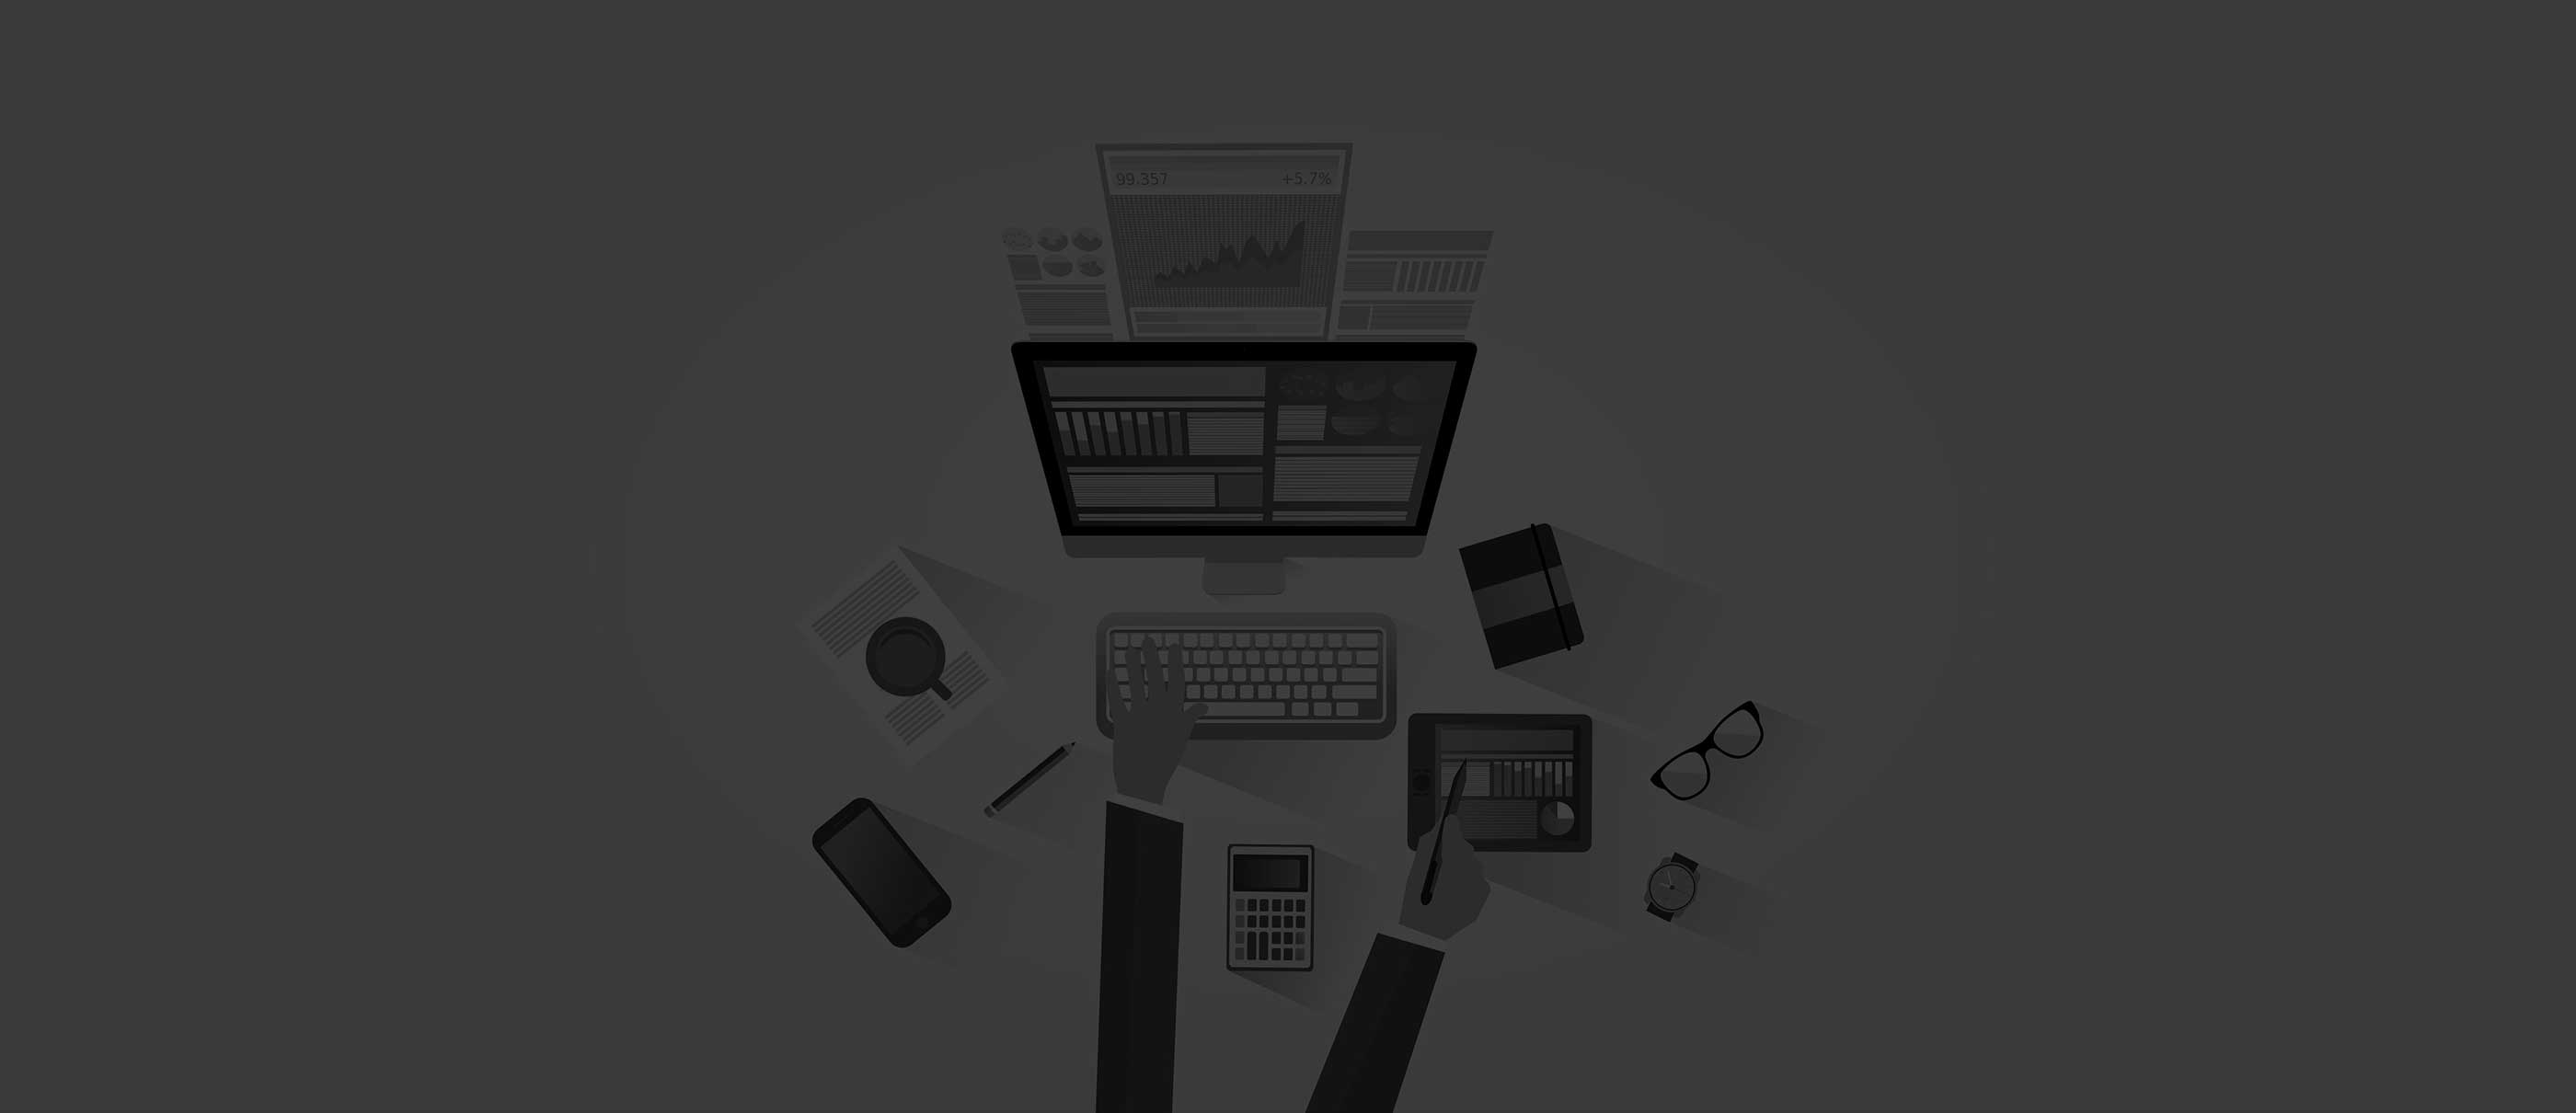 Kaleida: Key Tips To Improving A Business' Digital Efficiencies Banner